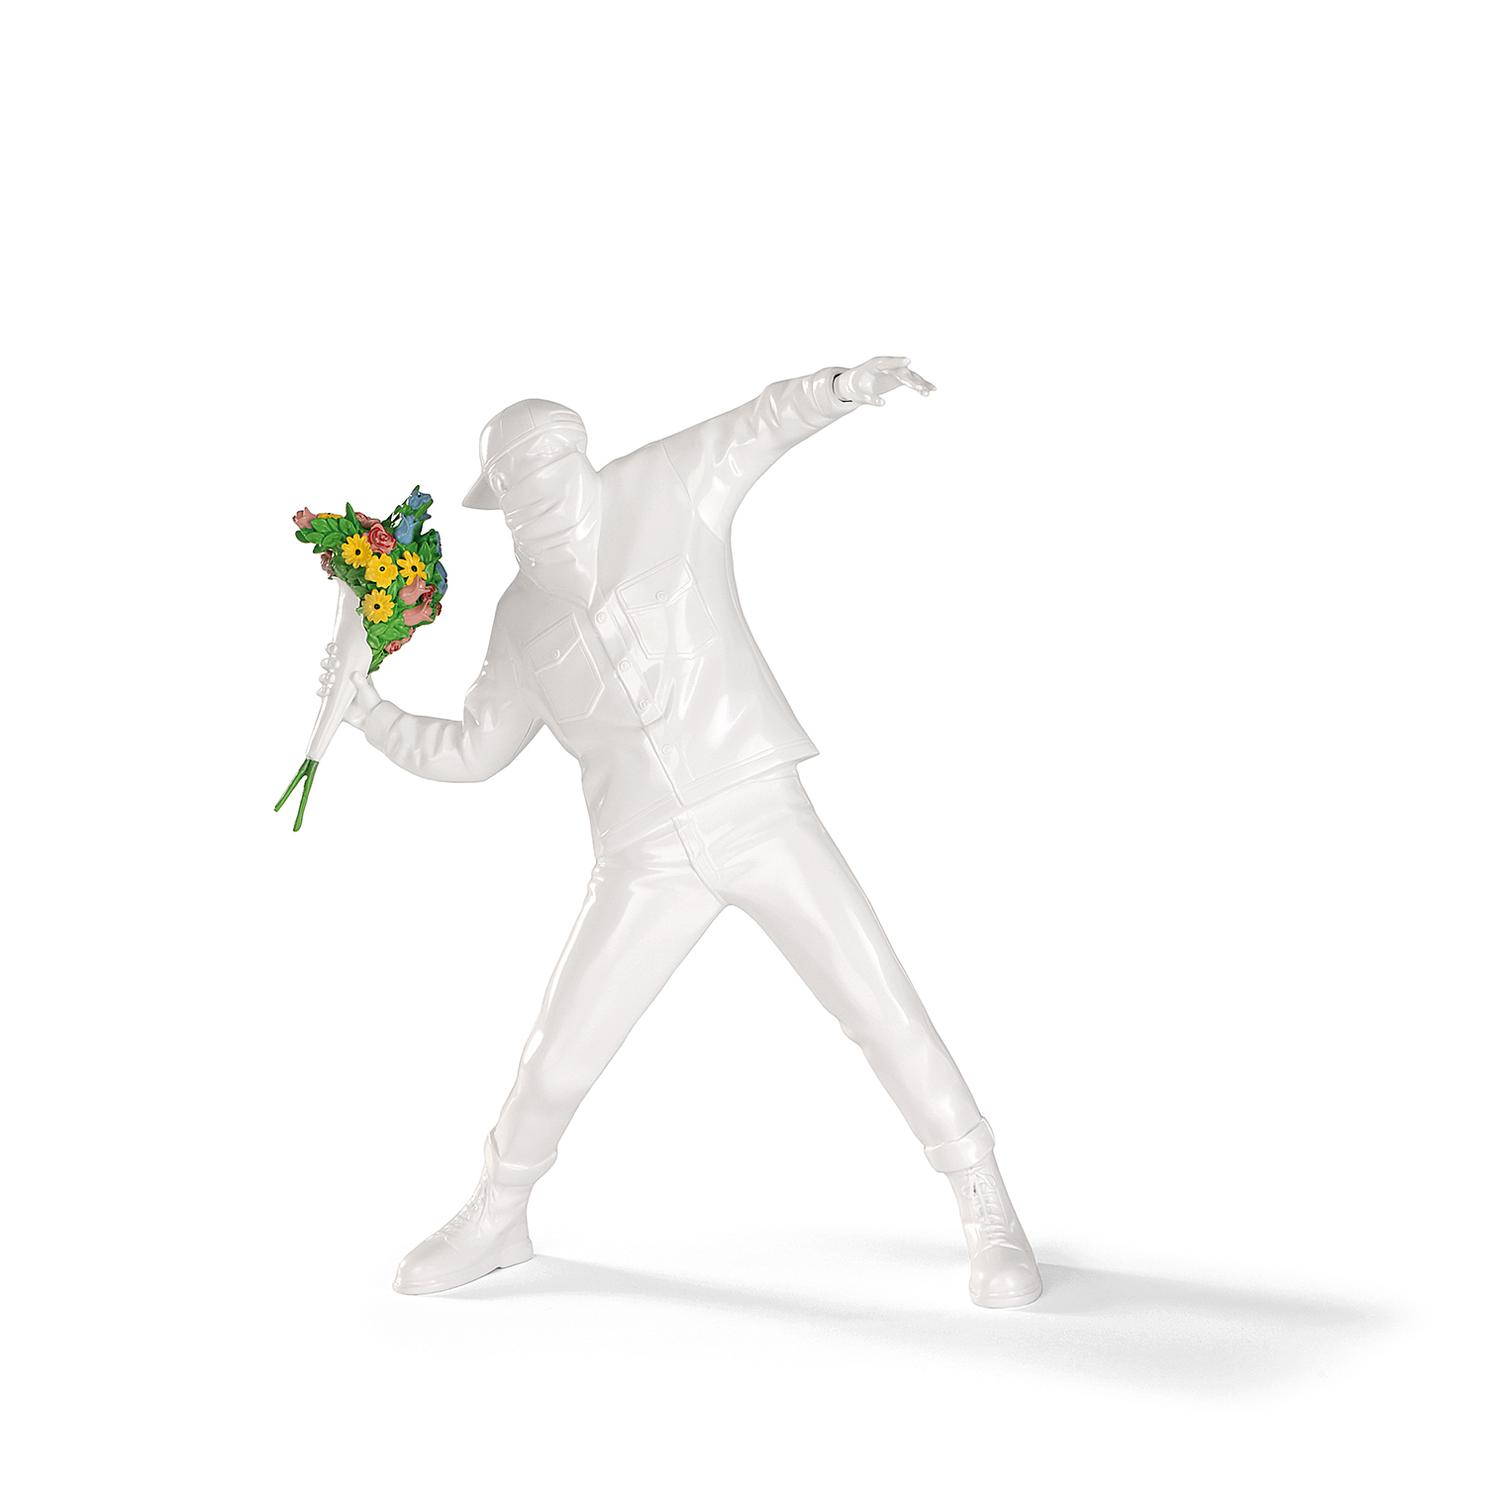 Banksy-Banksy Brandalism - Flower Bomber (White)-2017